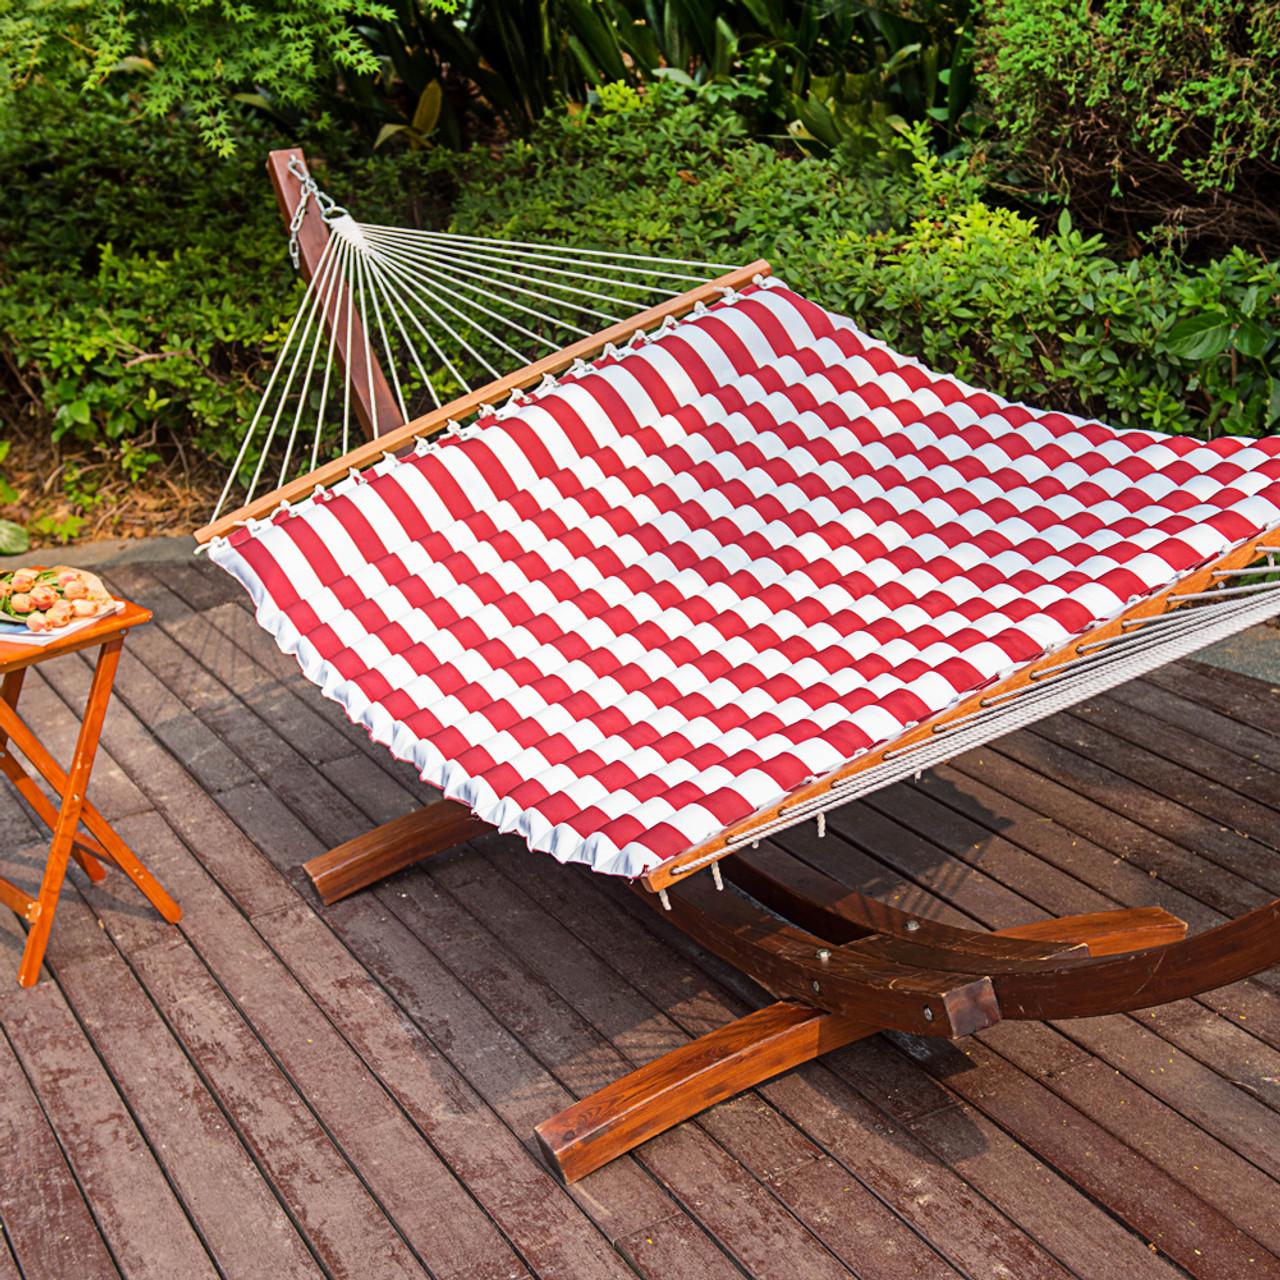 lazy daze hammocks double size pillow top hammock spreader bar heavy duty  sienna  lazydaze hammocks double size pillow top hammock spreader bar heavy      rh   sundaleoutdoor